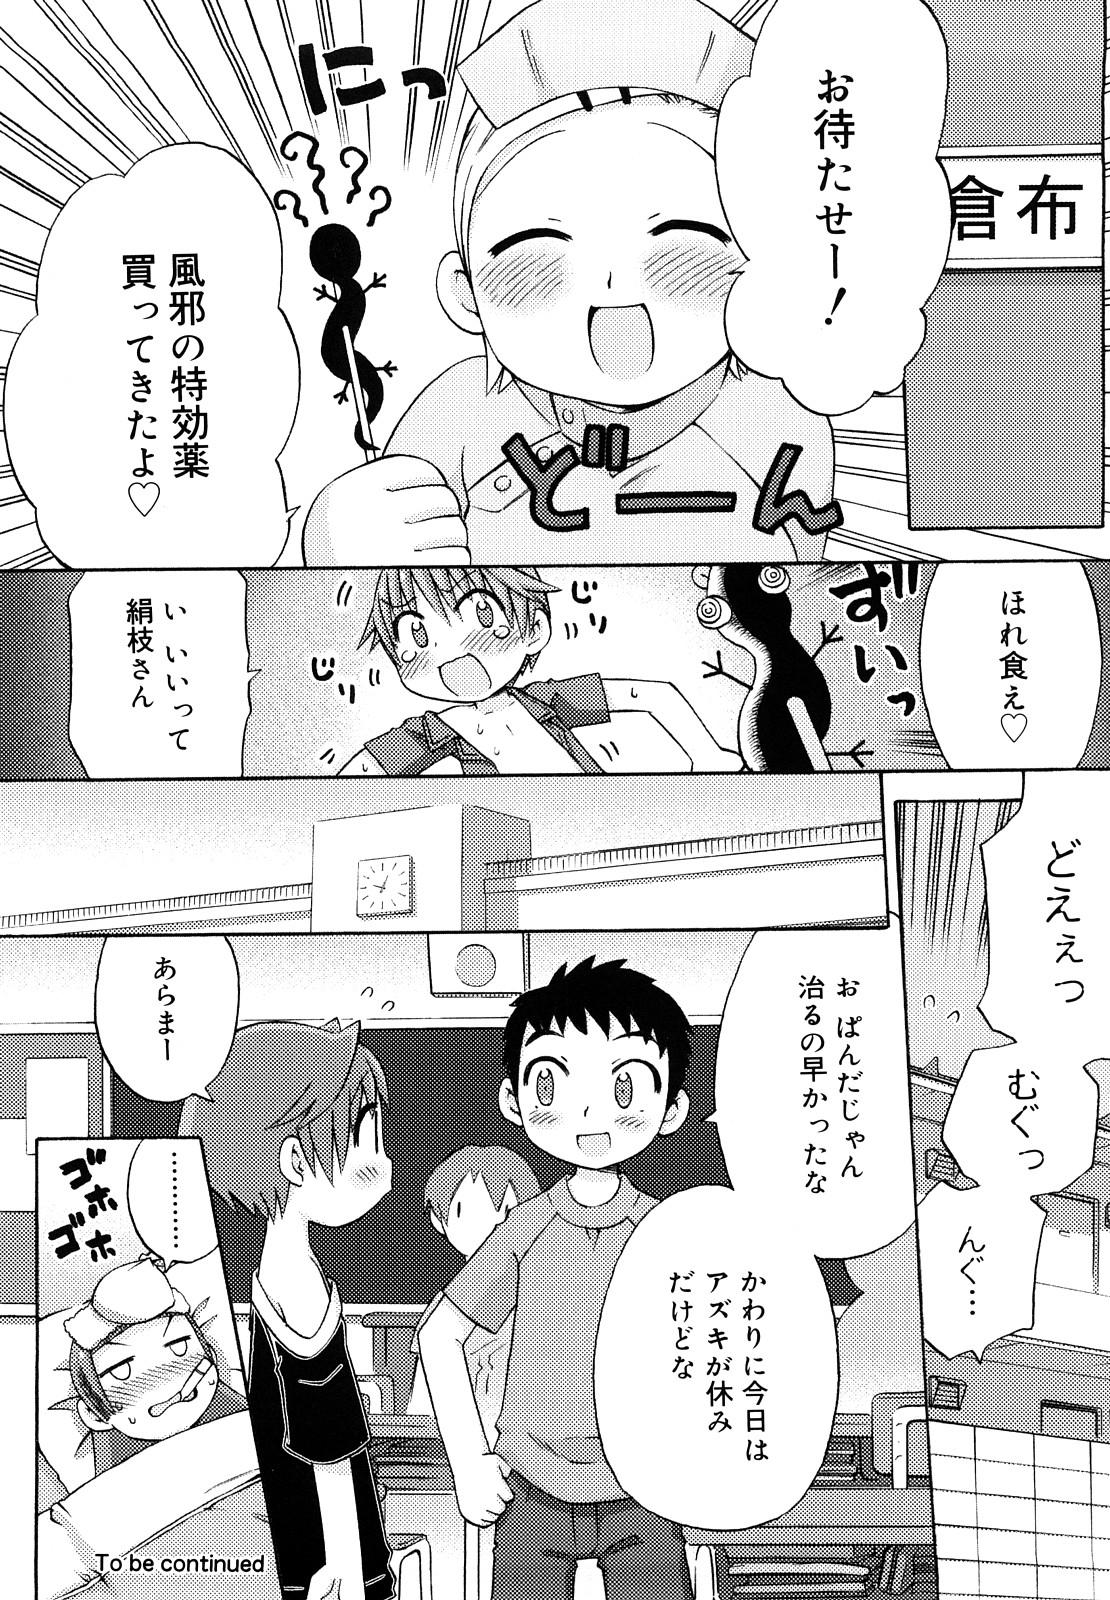 Hatsuden Pandakun! Shinsouban 64